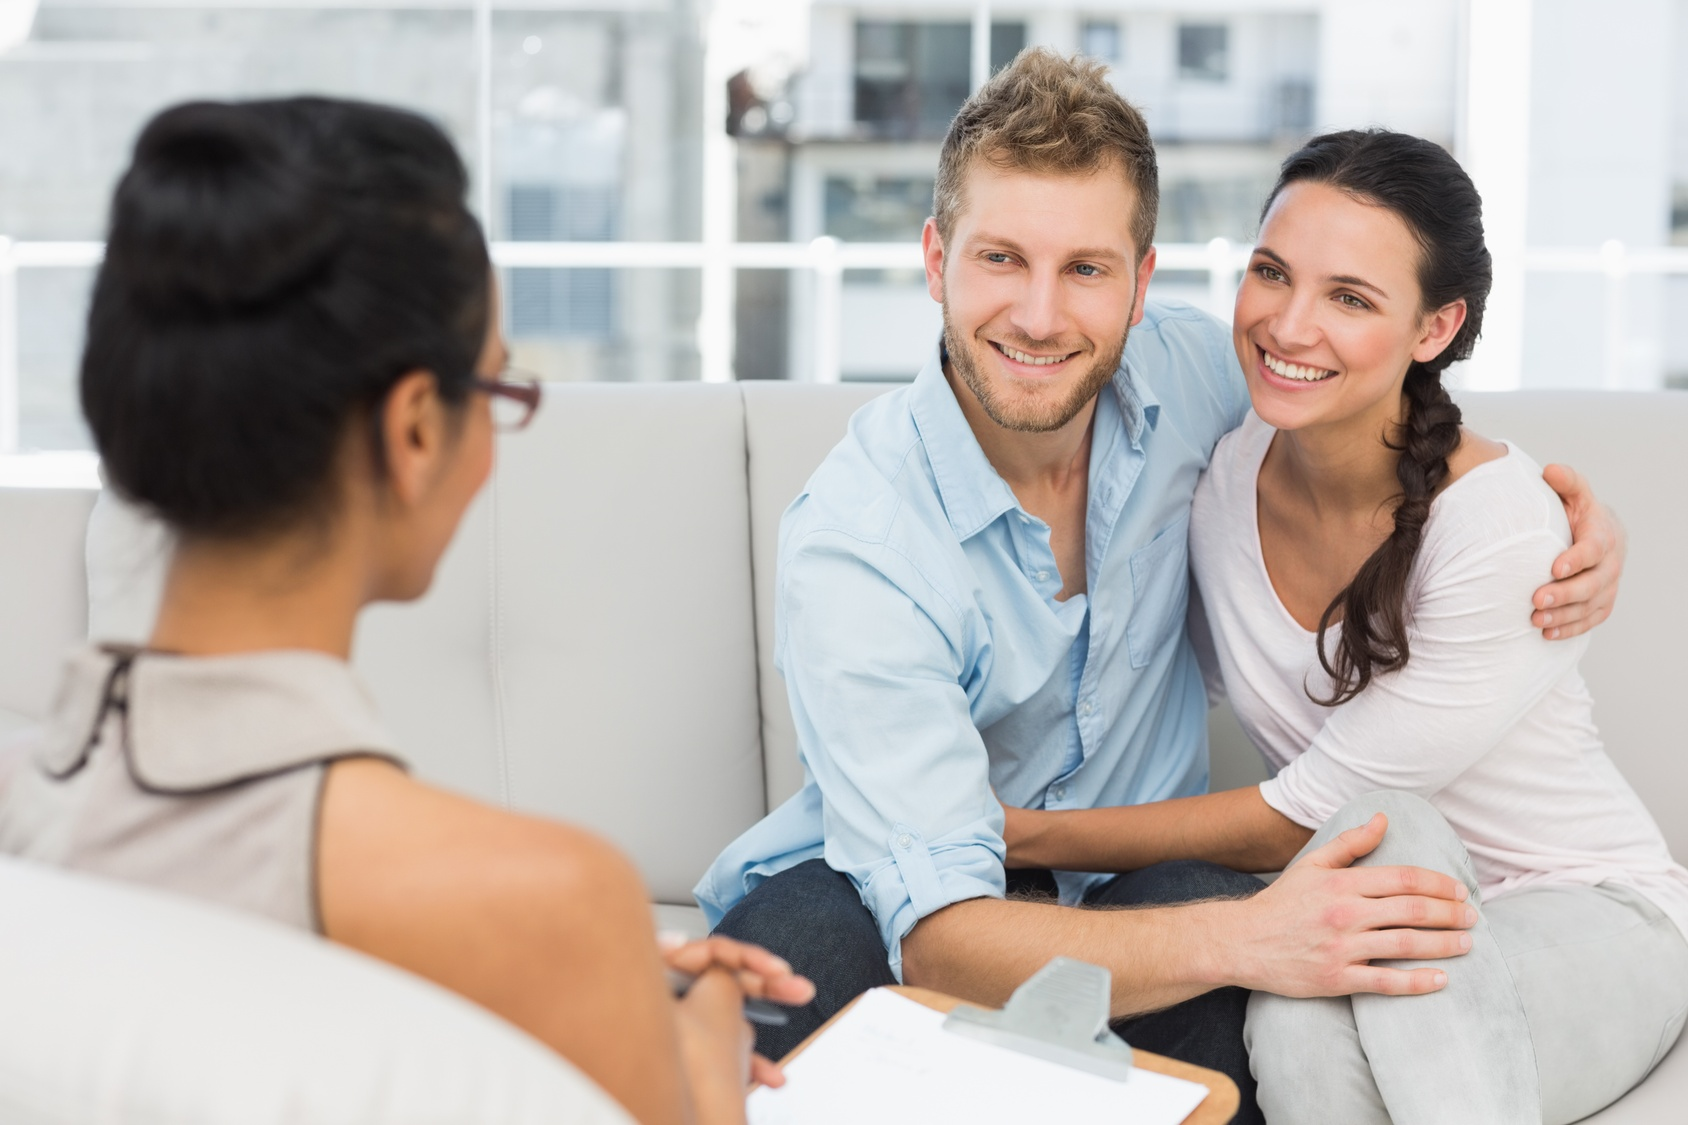 fertility counseling